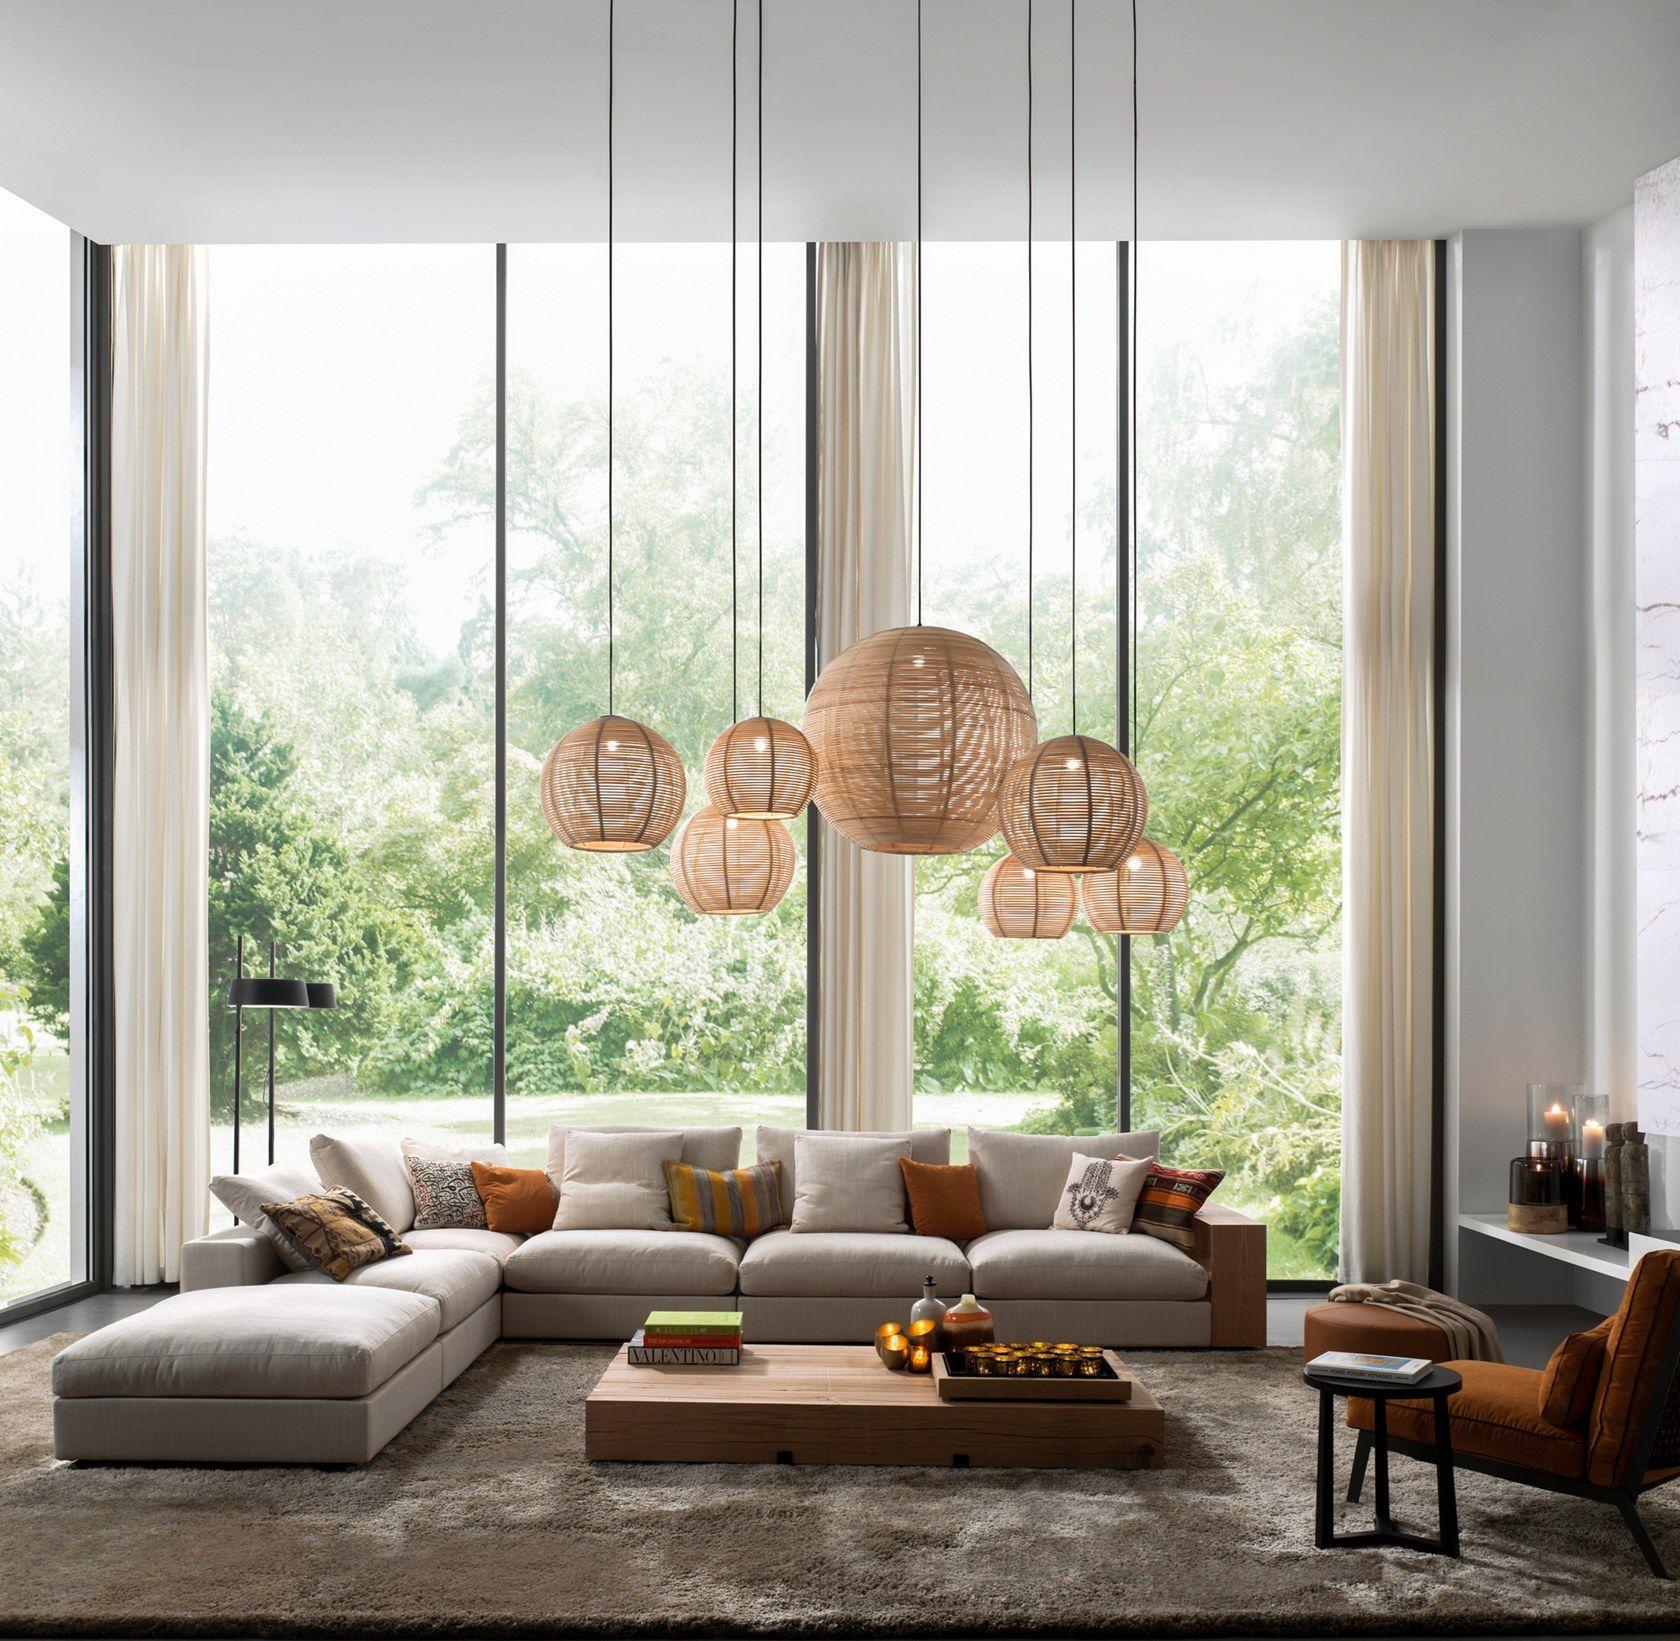 rattan pendant lamp sangha by dark at night living room on extraordinary living room ideas with lighting id=31699